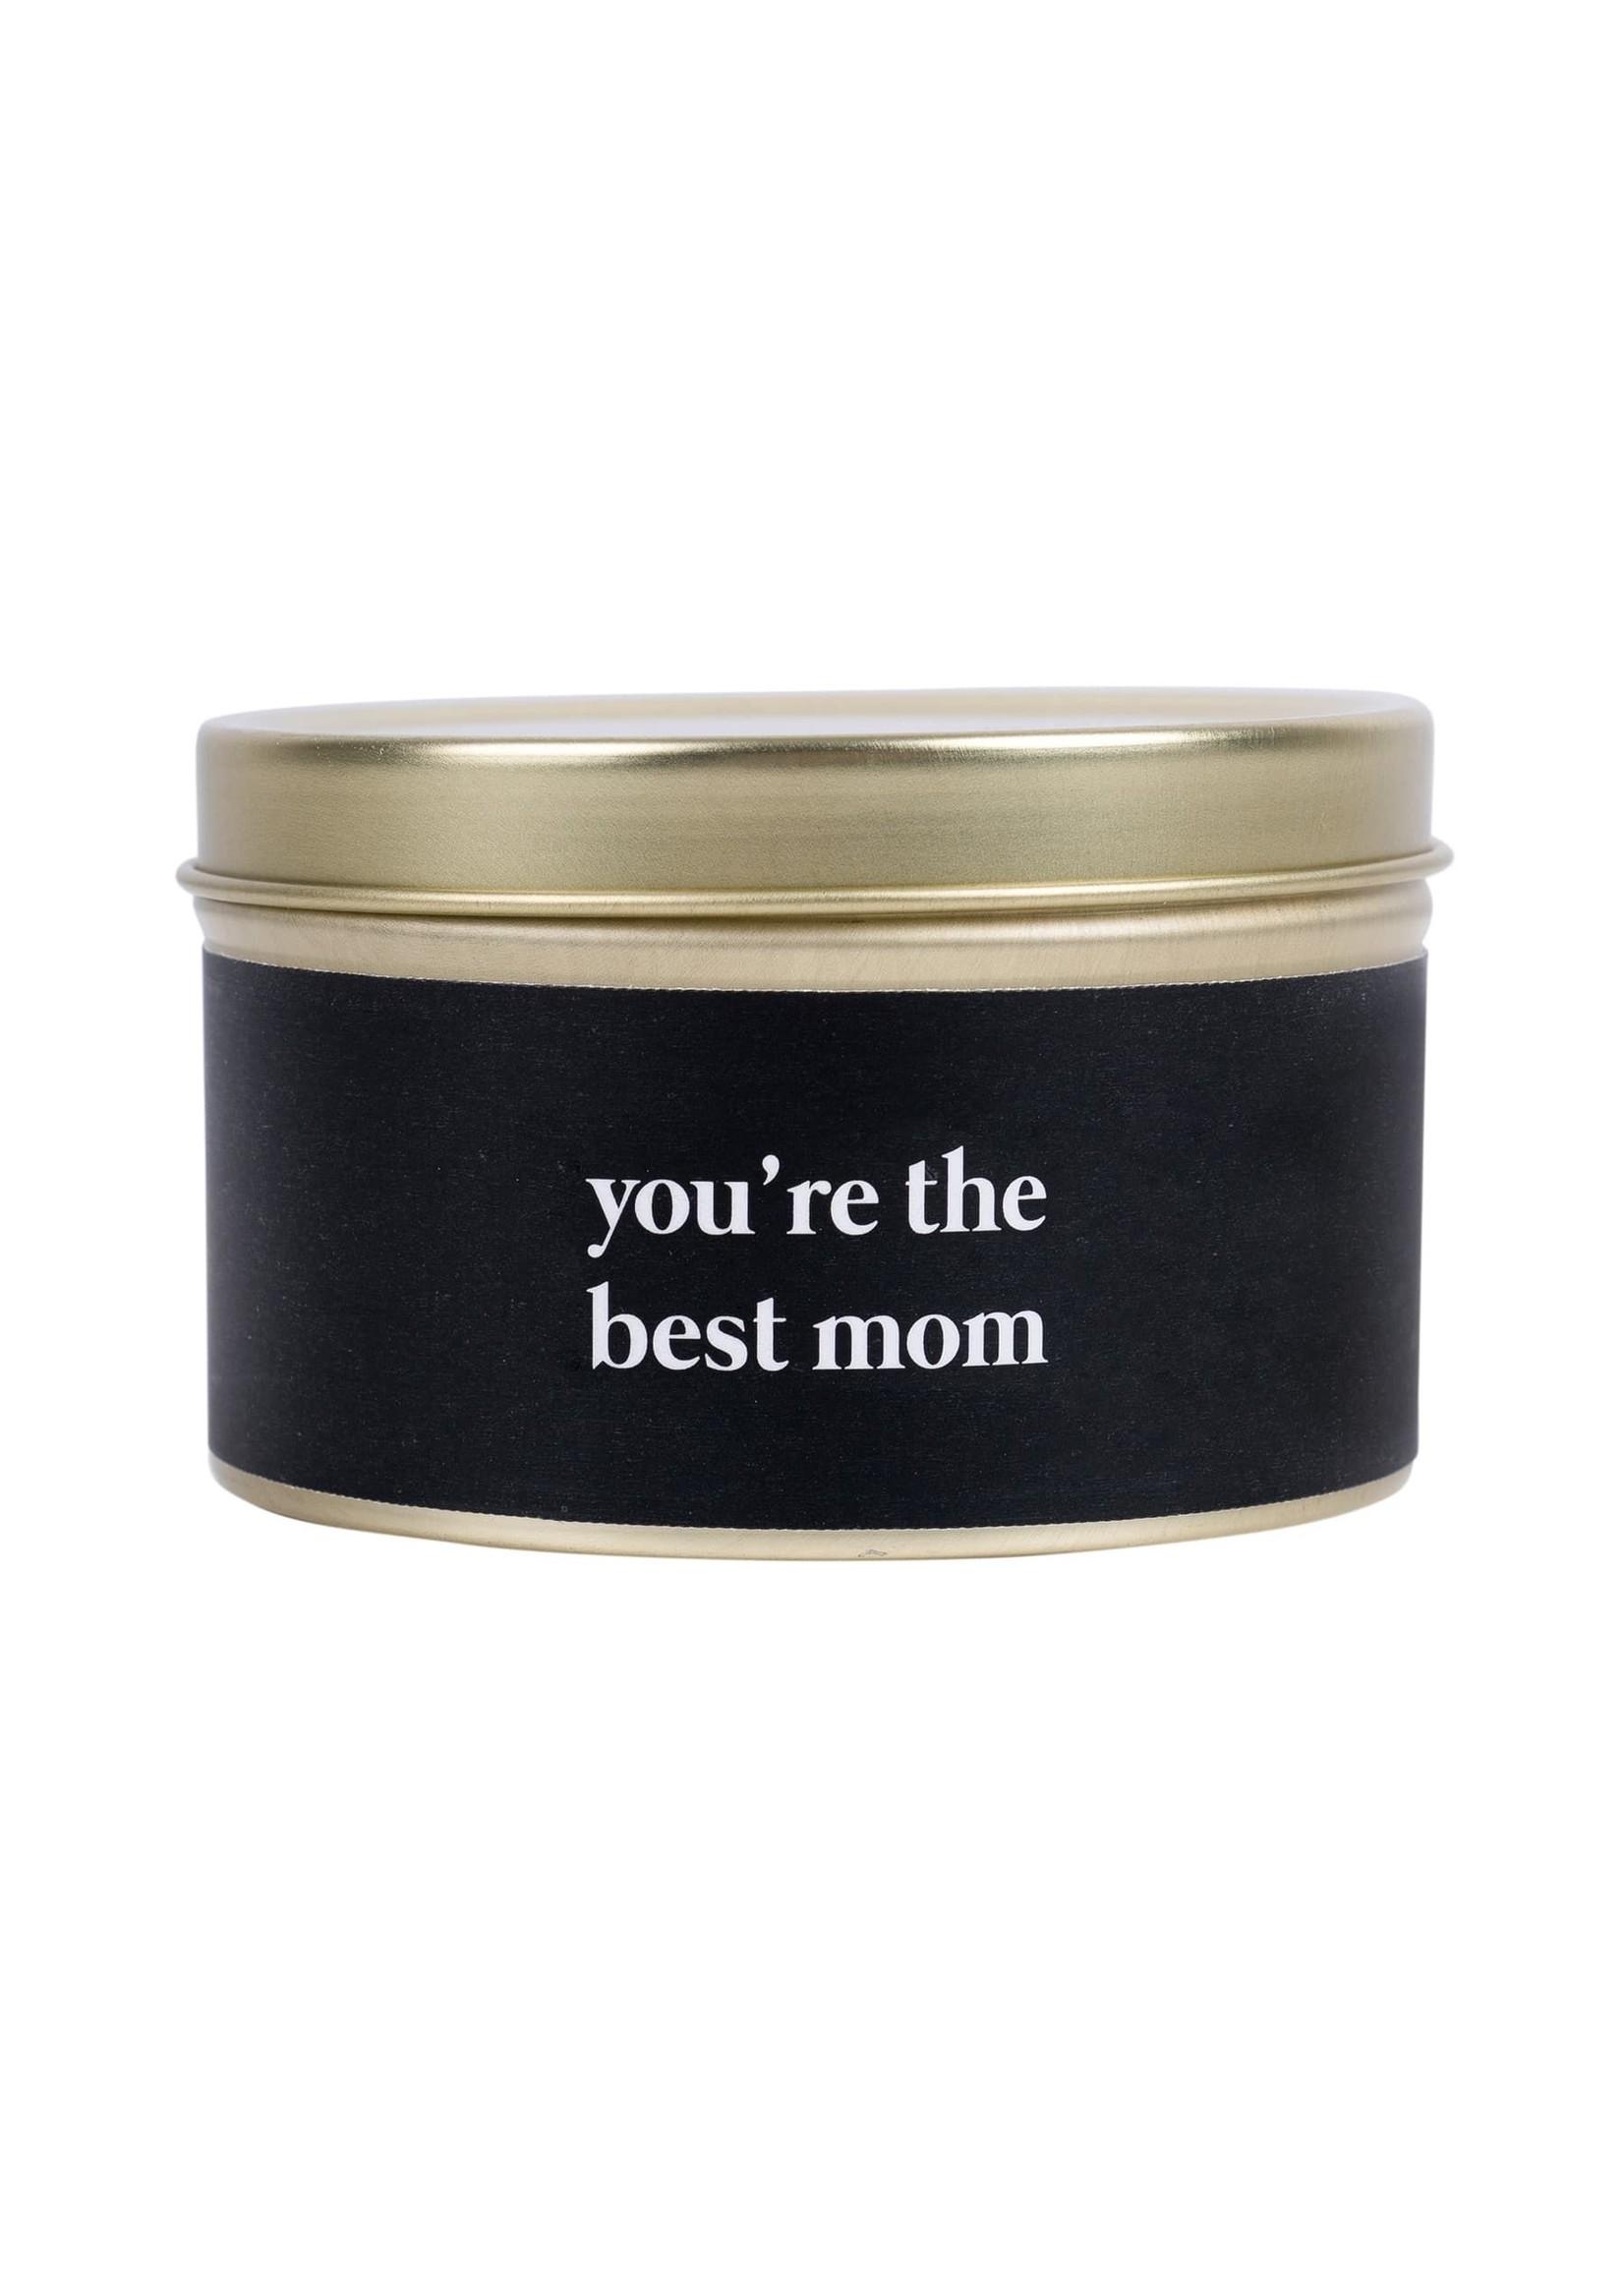 ZUSSS geurkaars in blik best mom